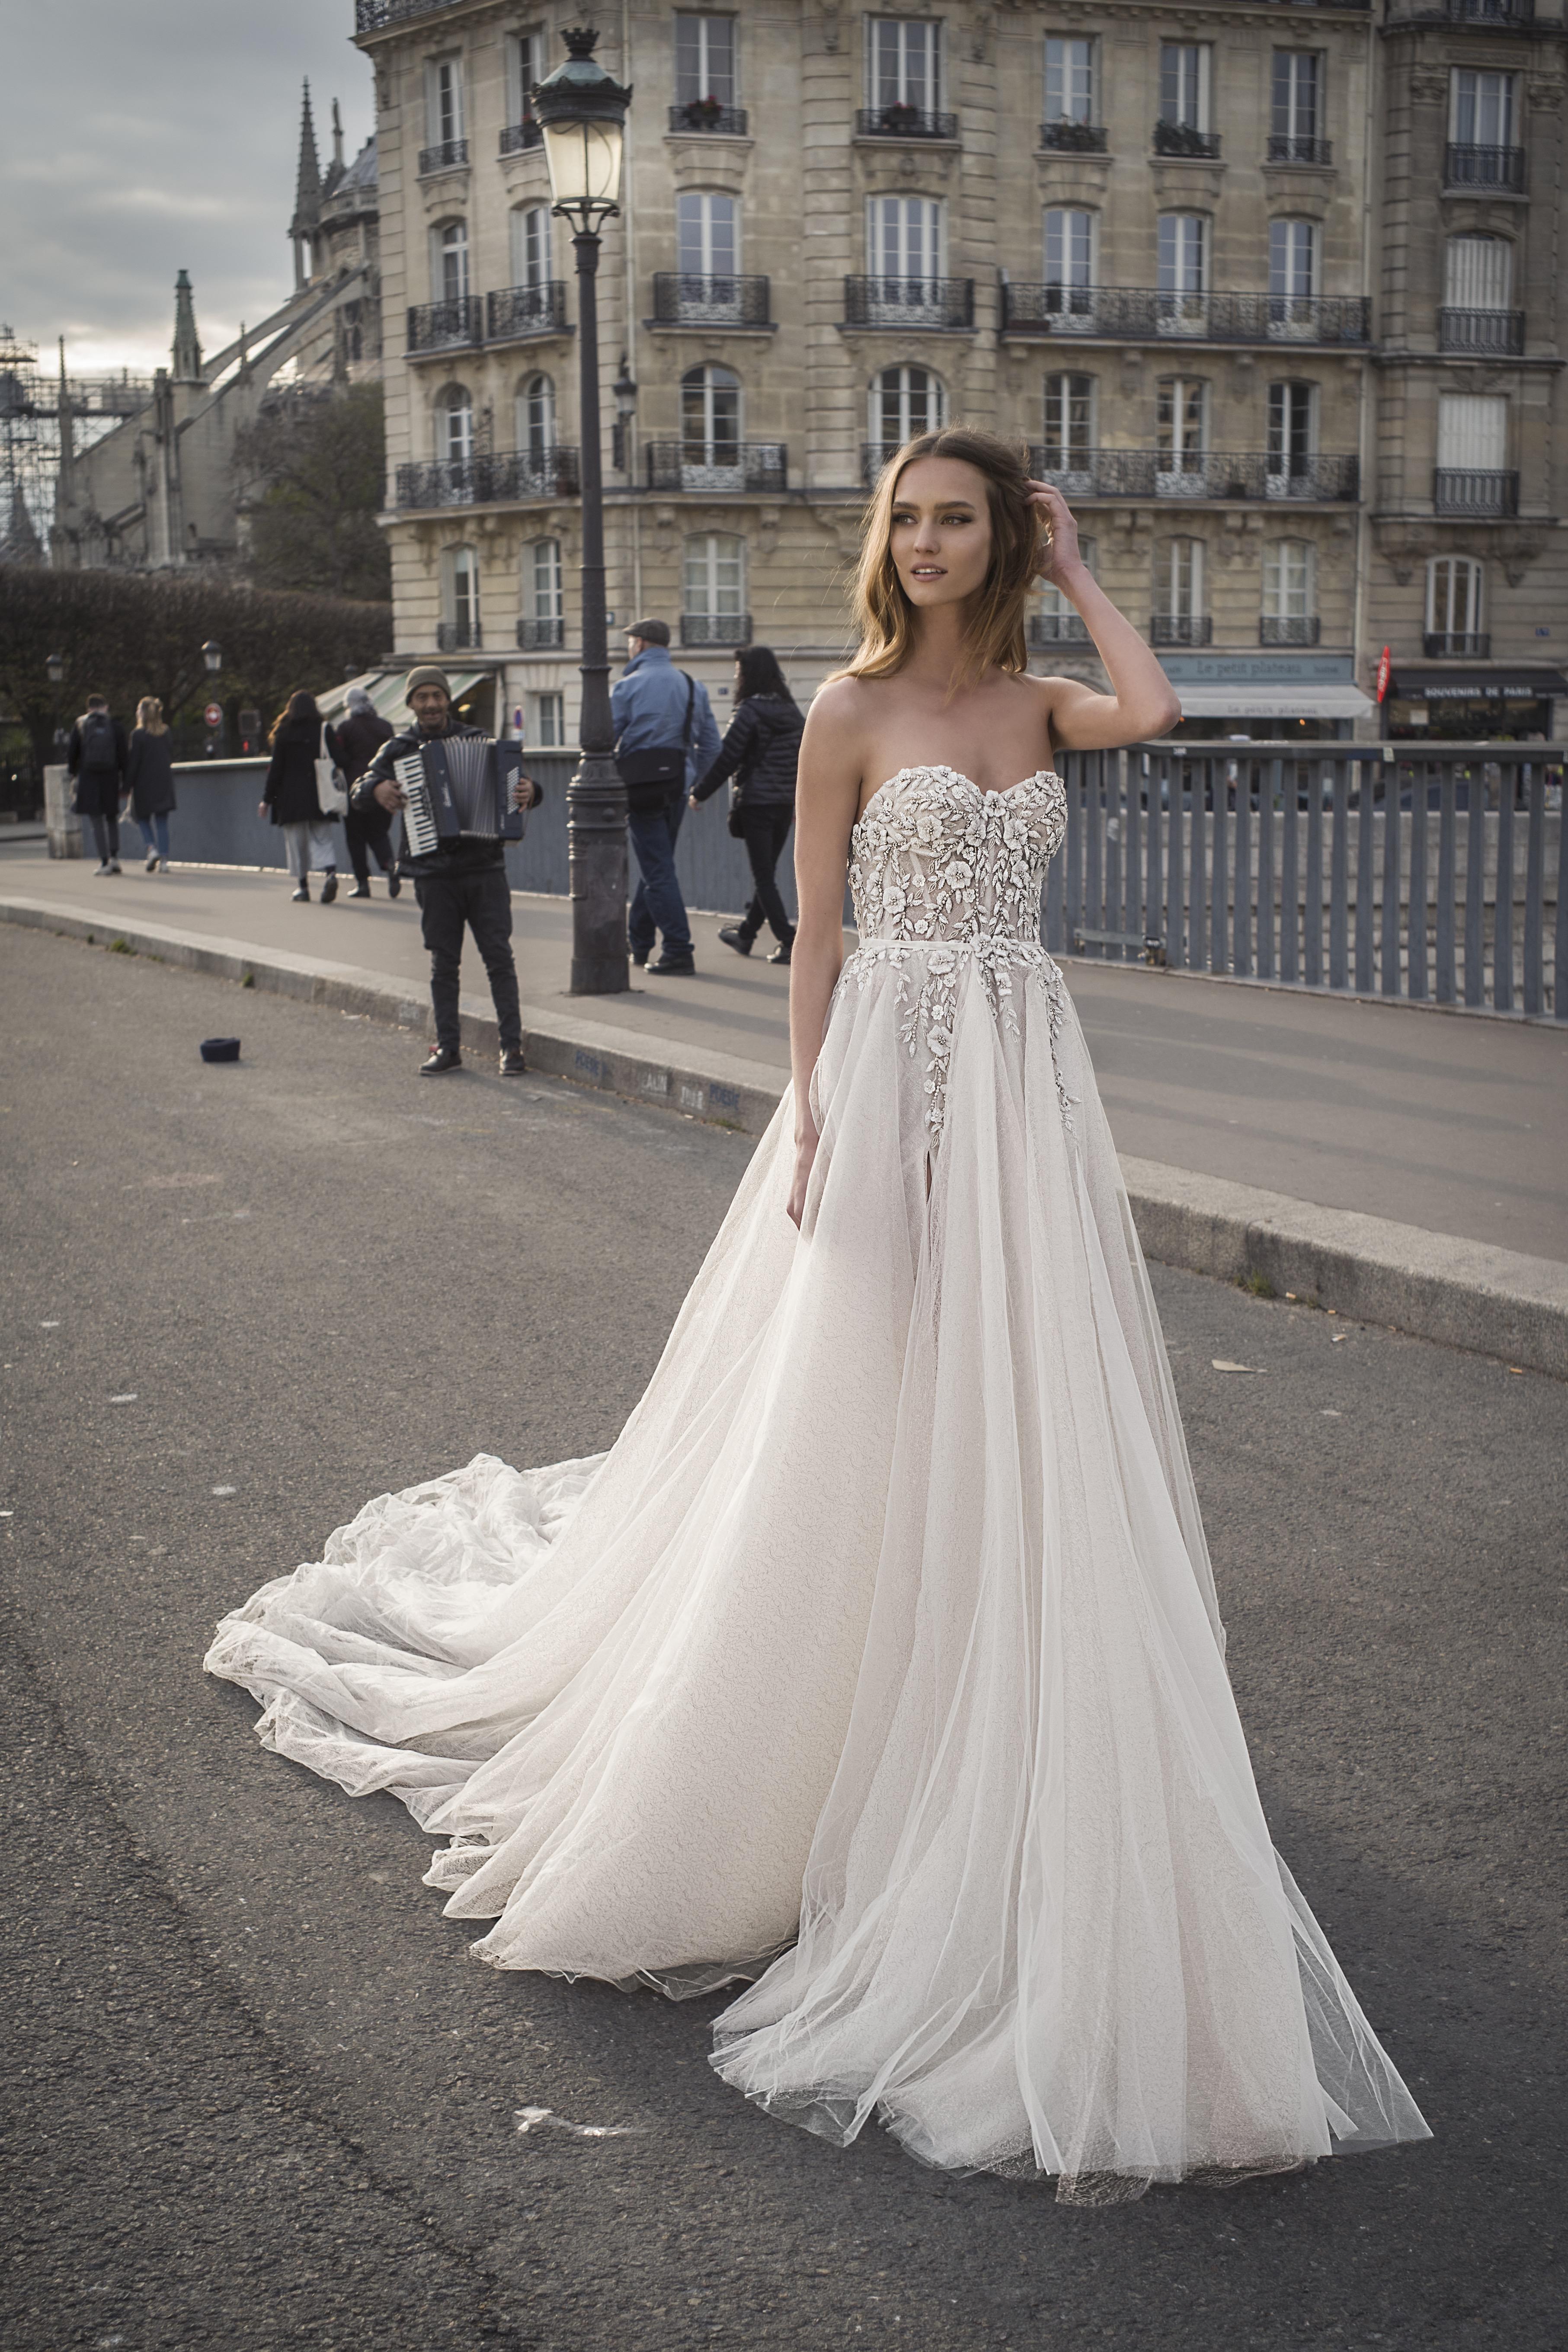 Mira Couture Netta Benshabu Shihlo Wedding Dress Bridal Gown Israeli Designer Chicago Boutique Front